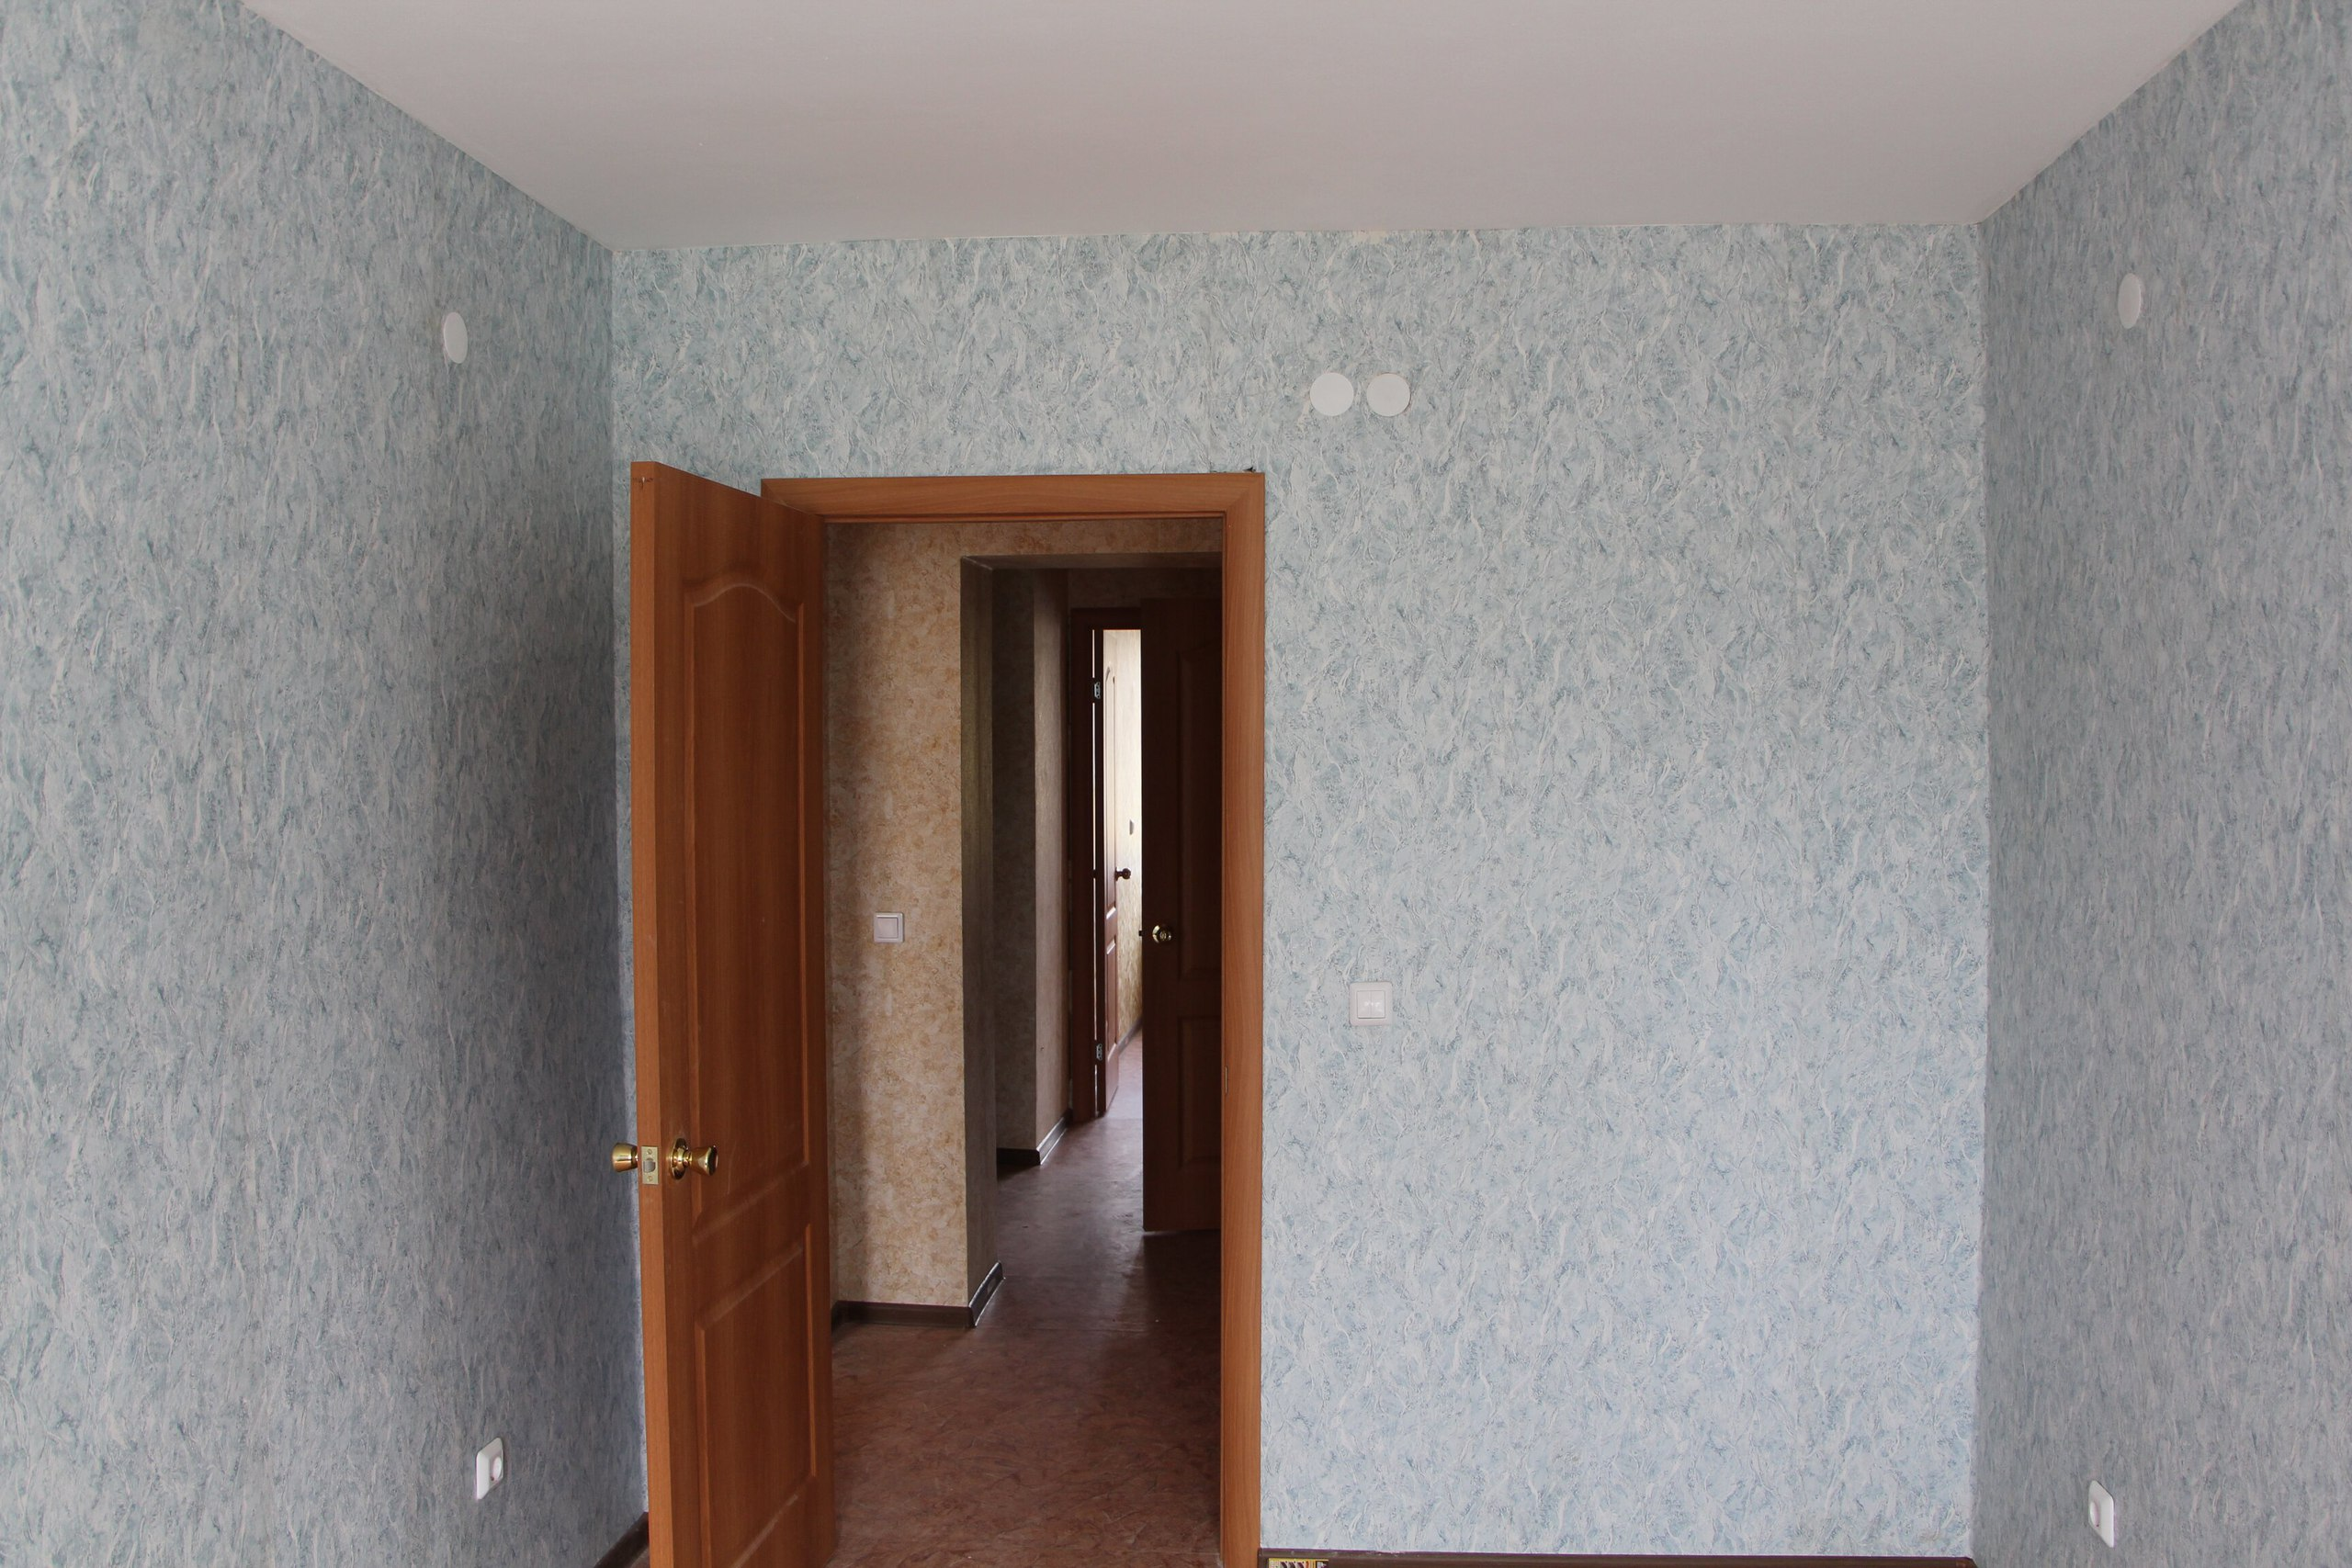 31 августа жители усогорского дома получат ключи